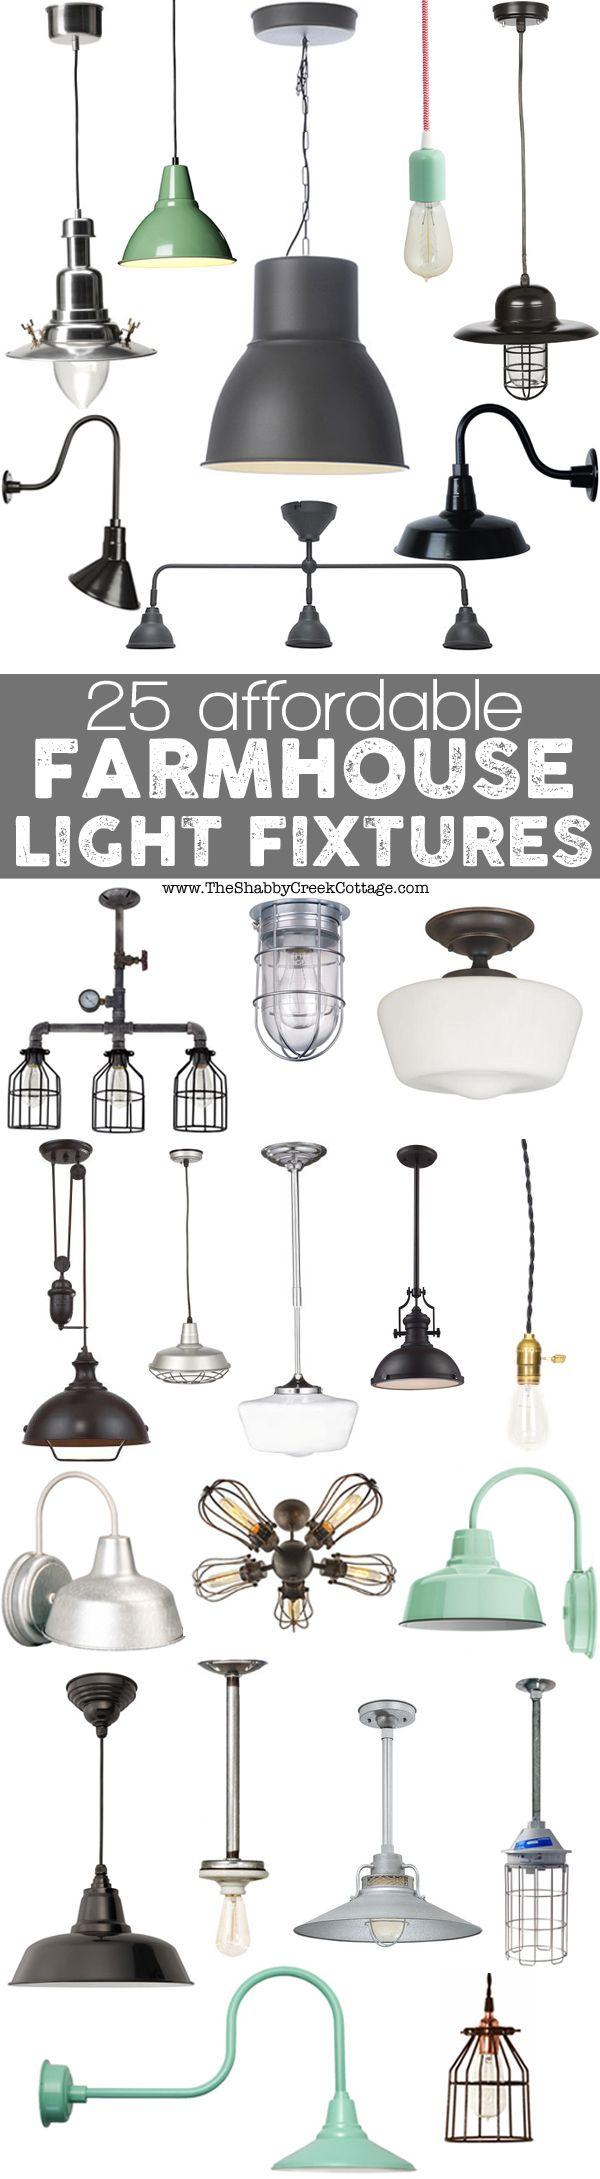 lighting ideas farmhouse kitchen lighting 25 affordable farmhouse light fixtures